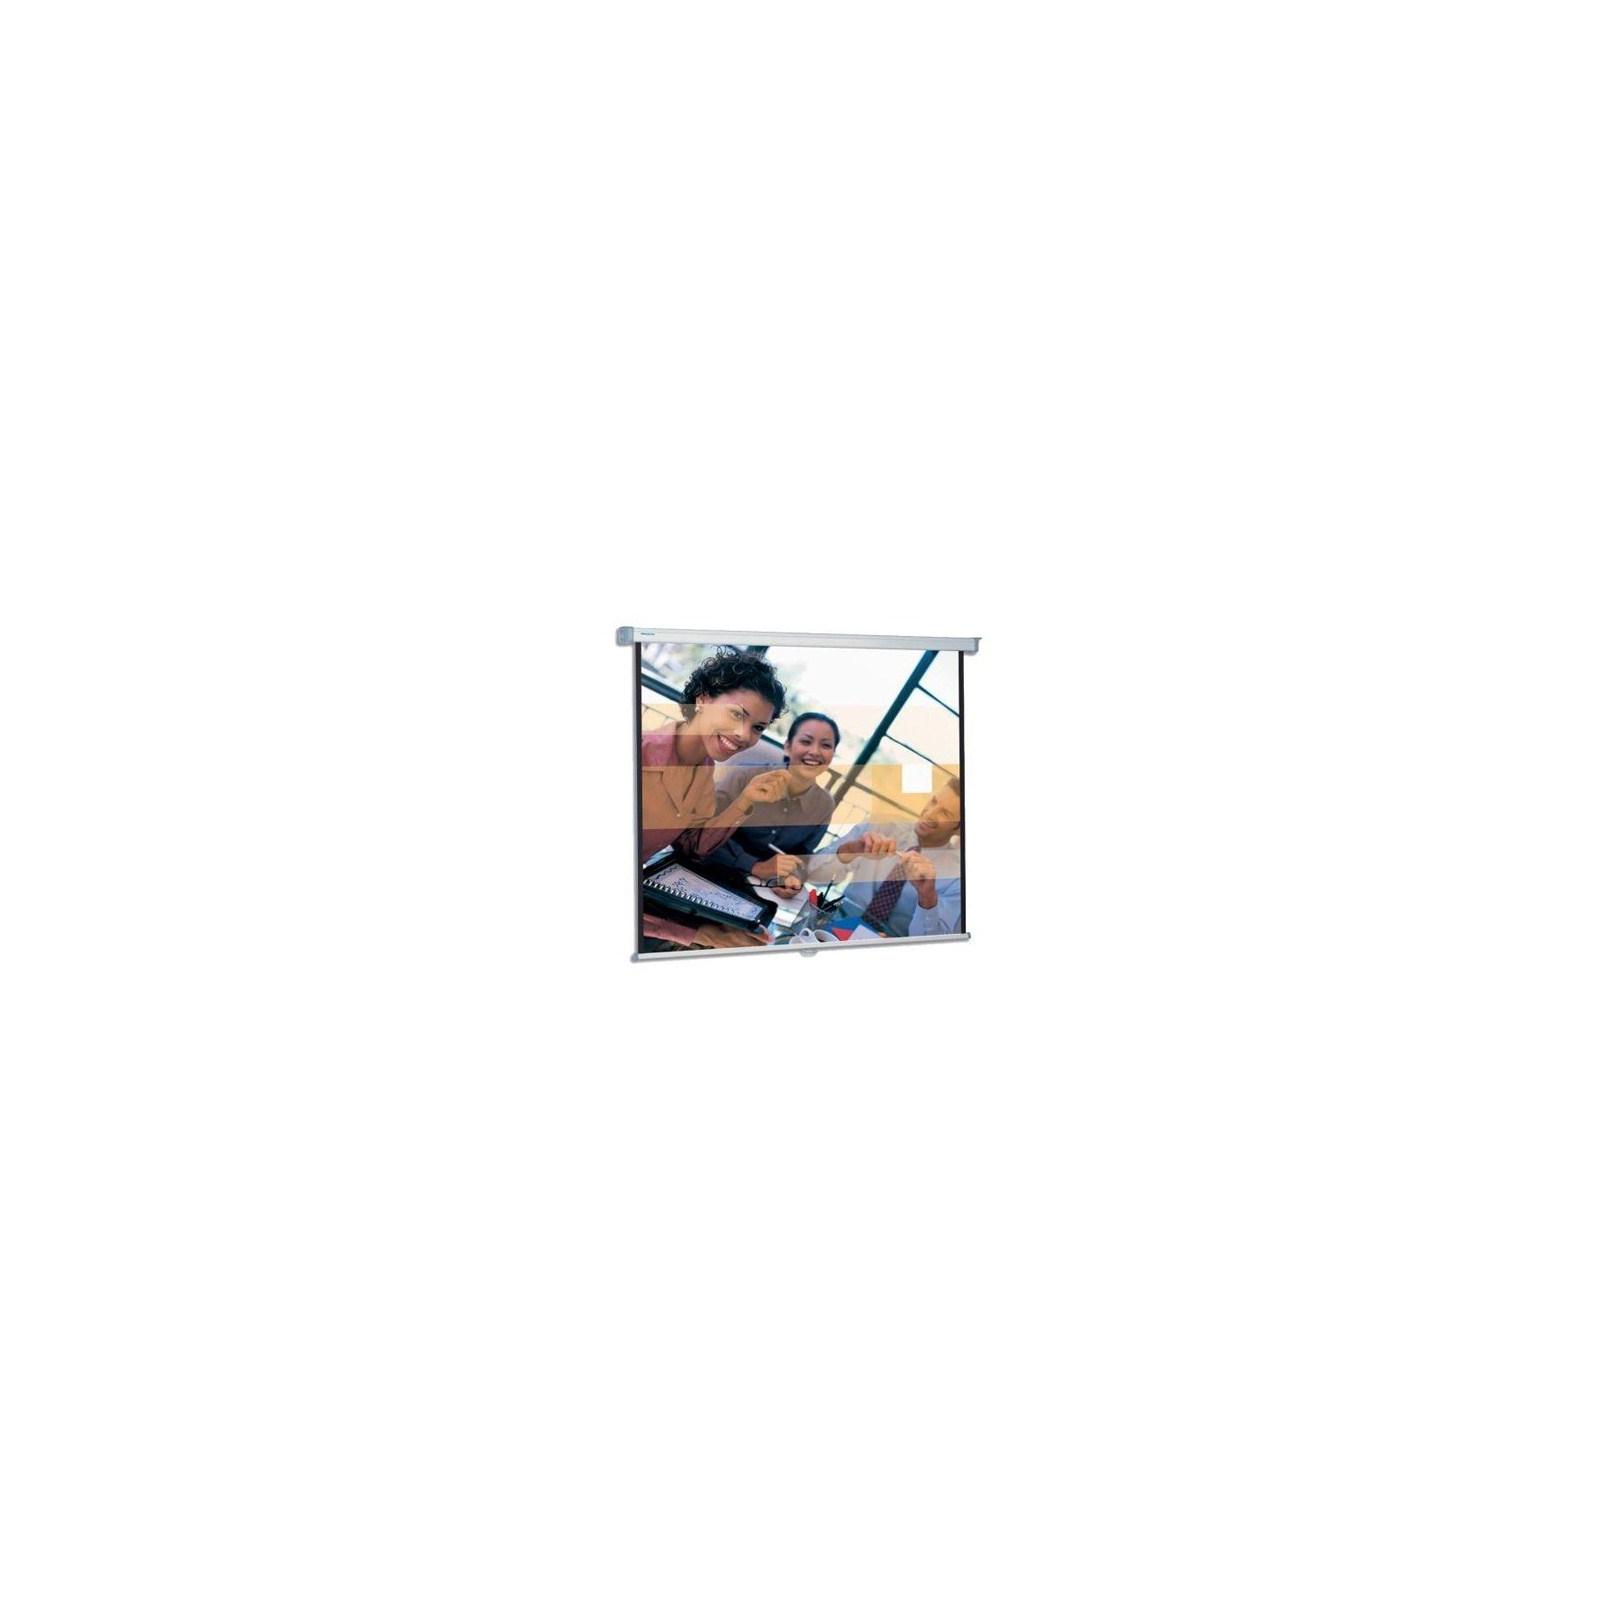 Проекционный экран SlimScreen MWS 200x200см Projecta (10200064)